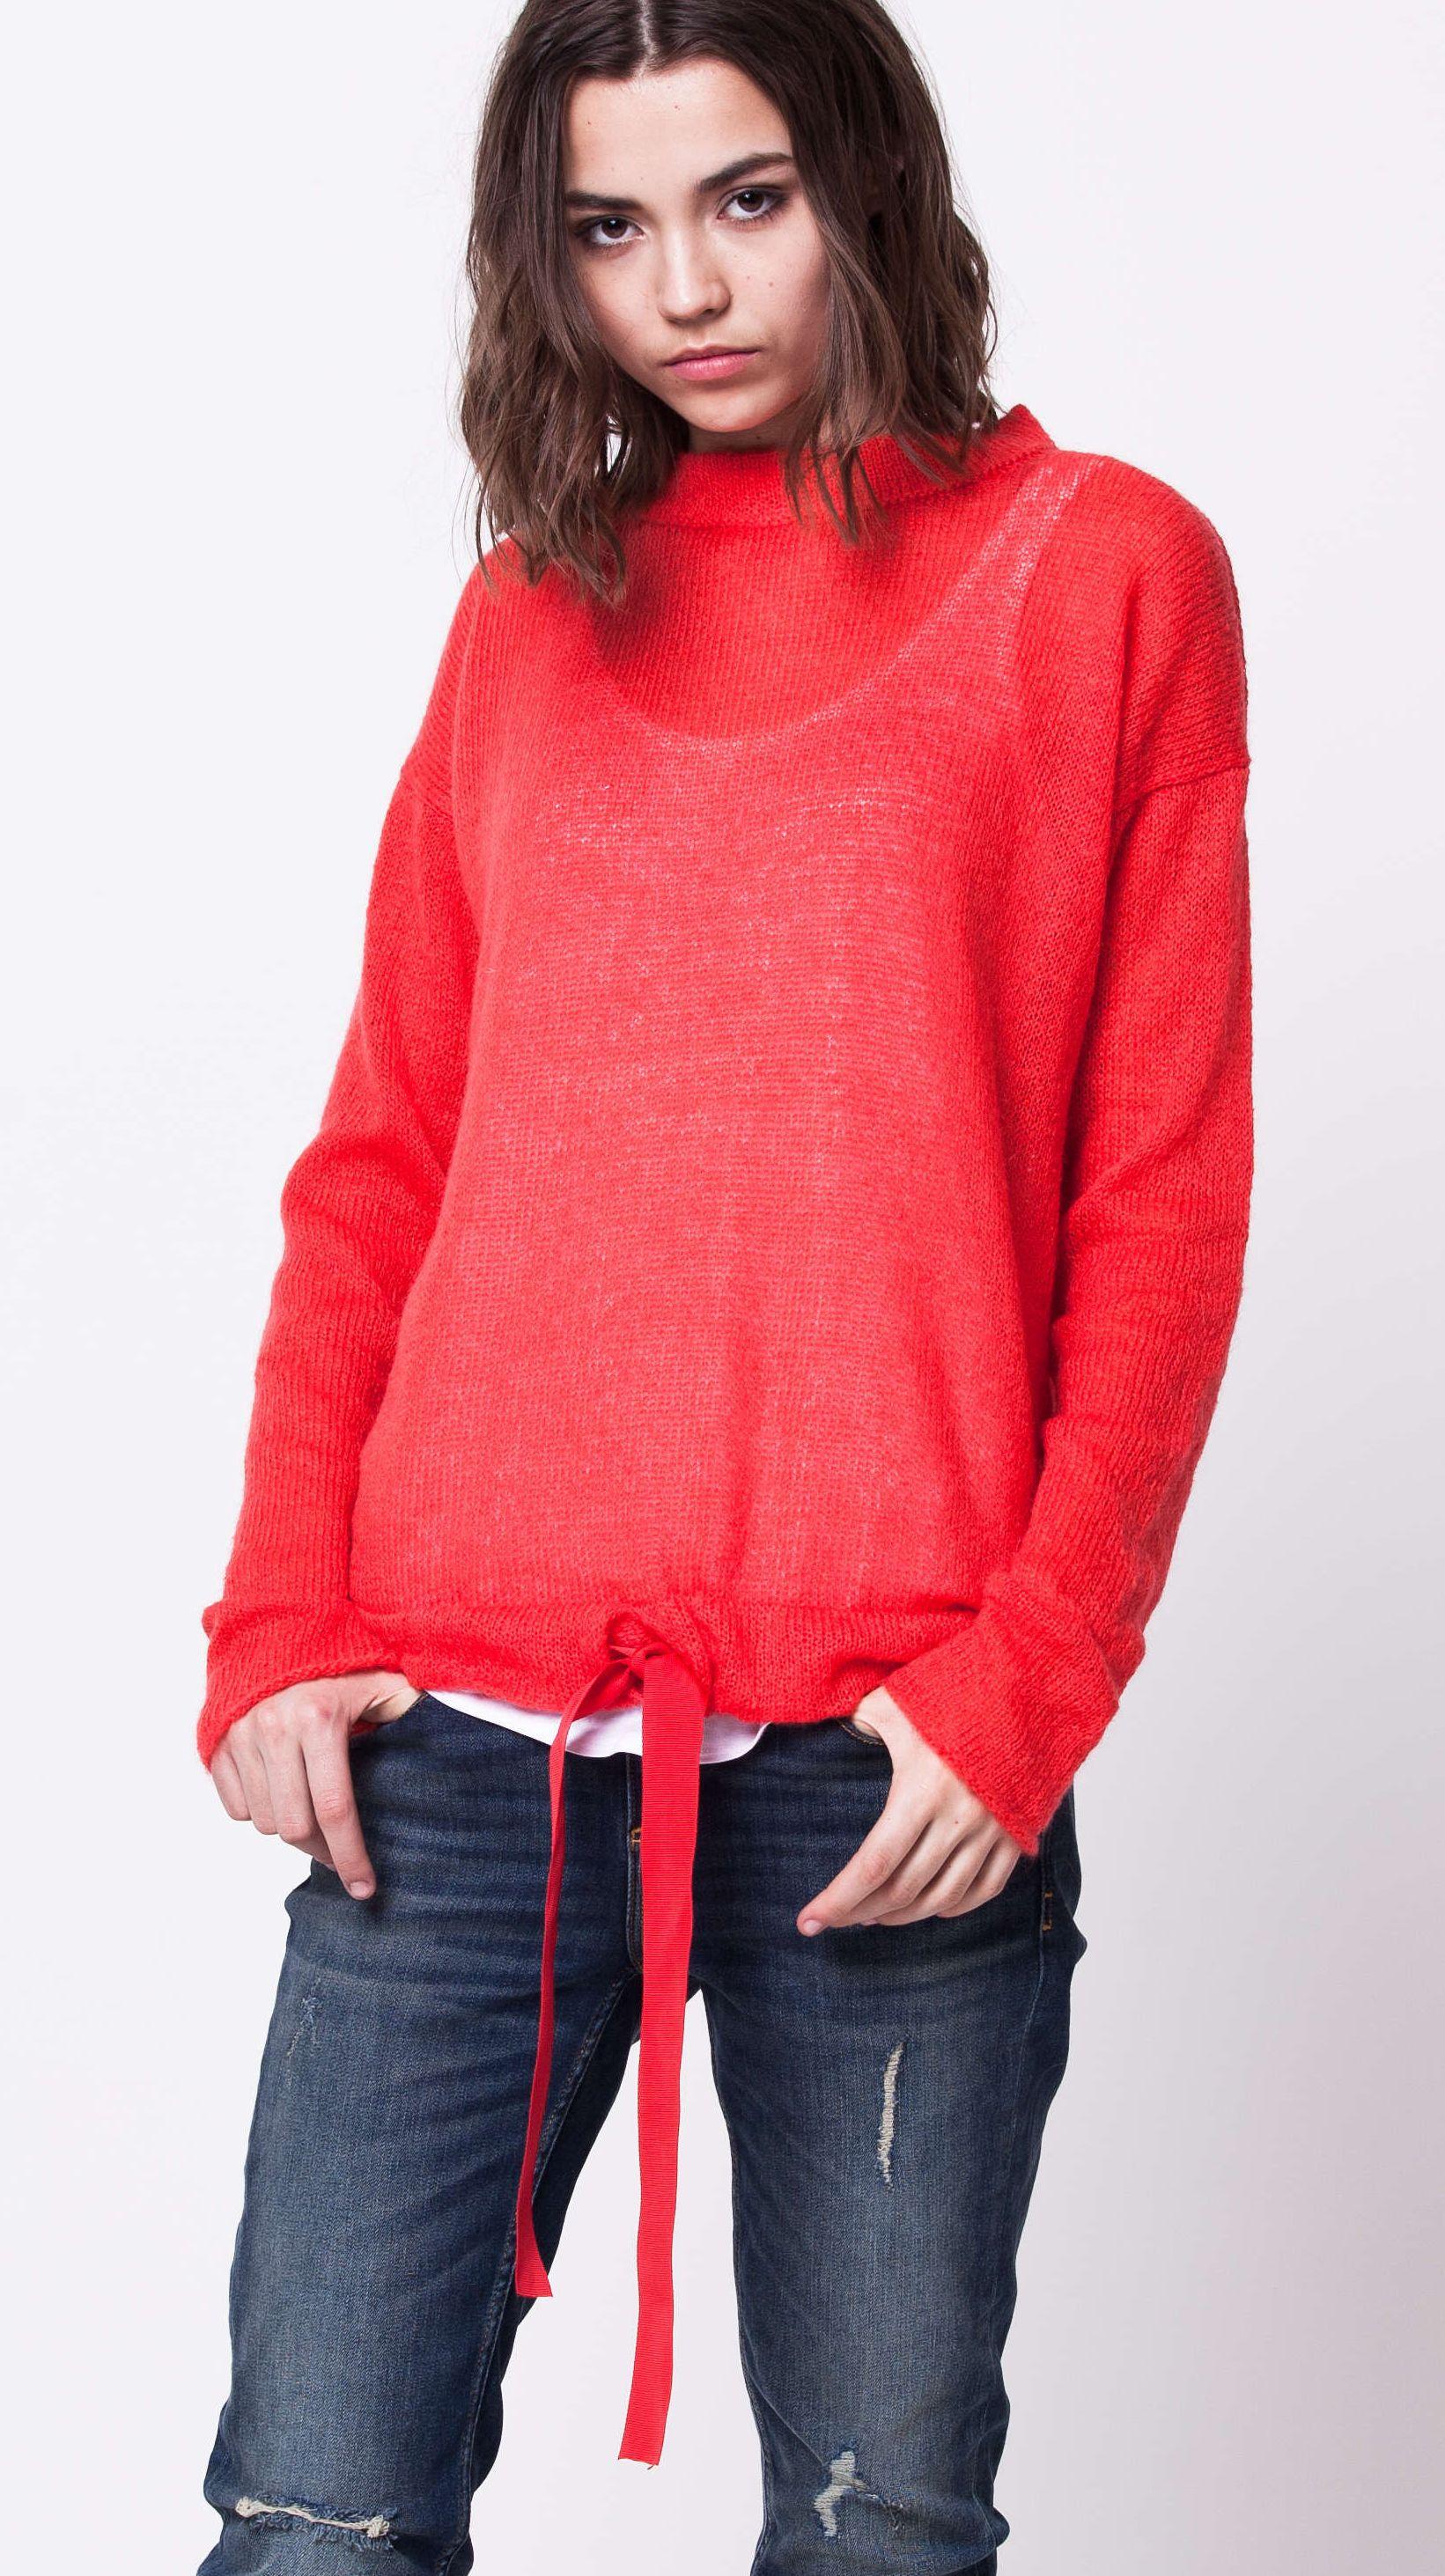 Red kidmohair crew neck womens sweater damen pullover KARI